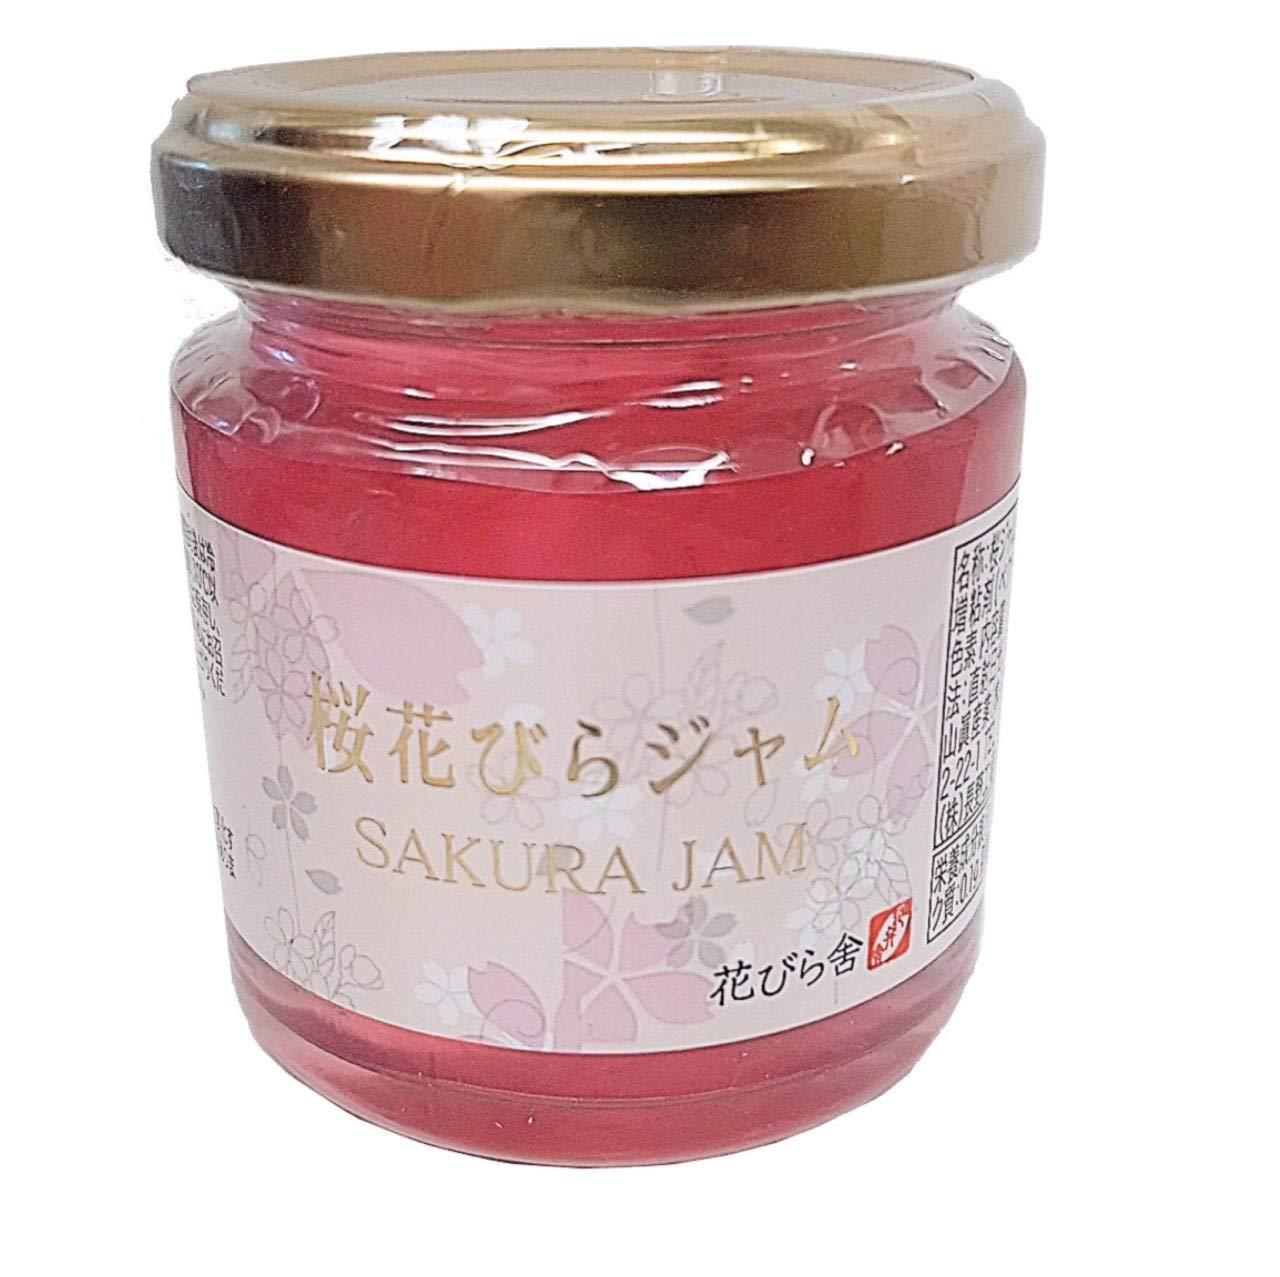 Japanese Sakura Cherry Blossom Jam 110g (3.88oz)